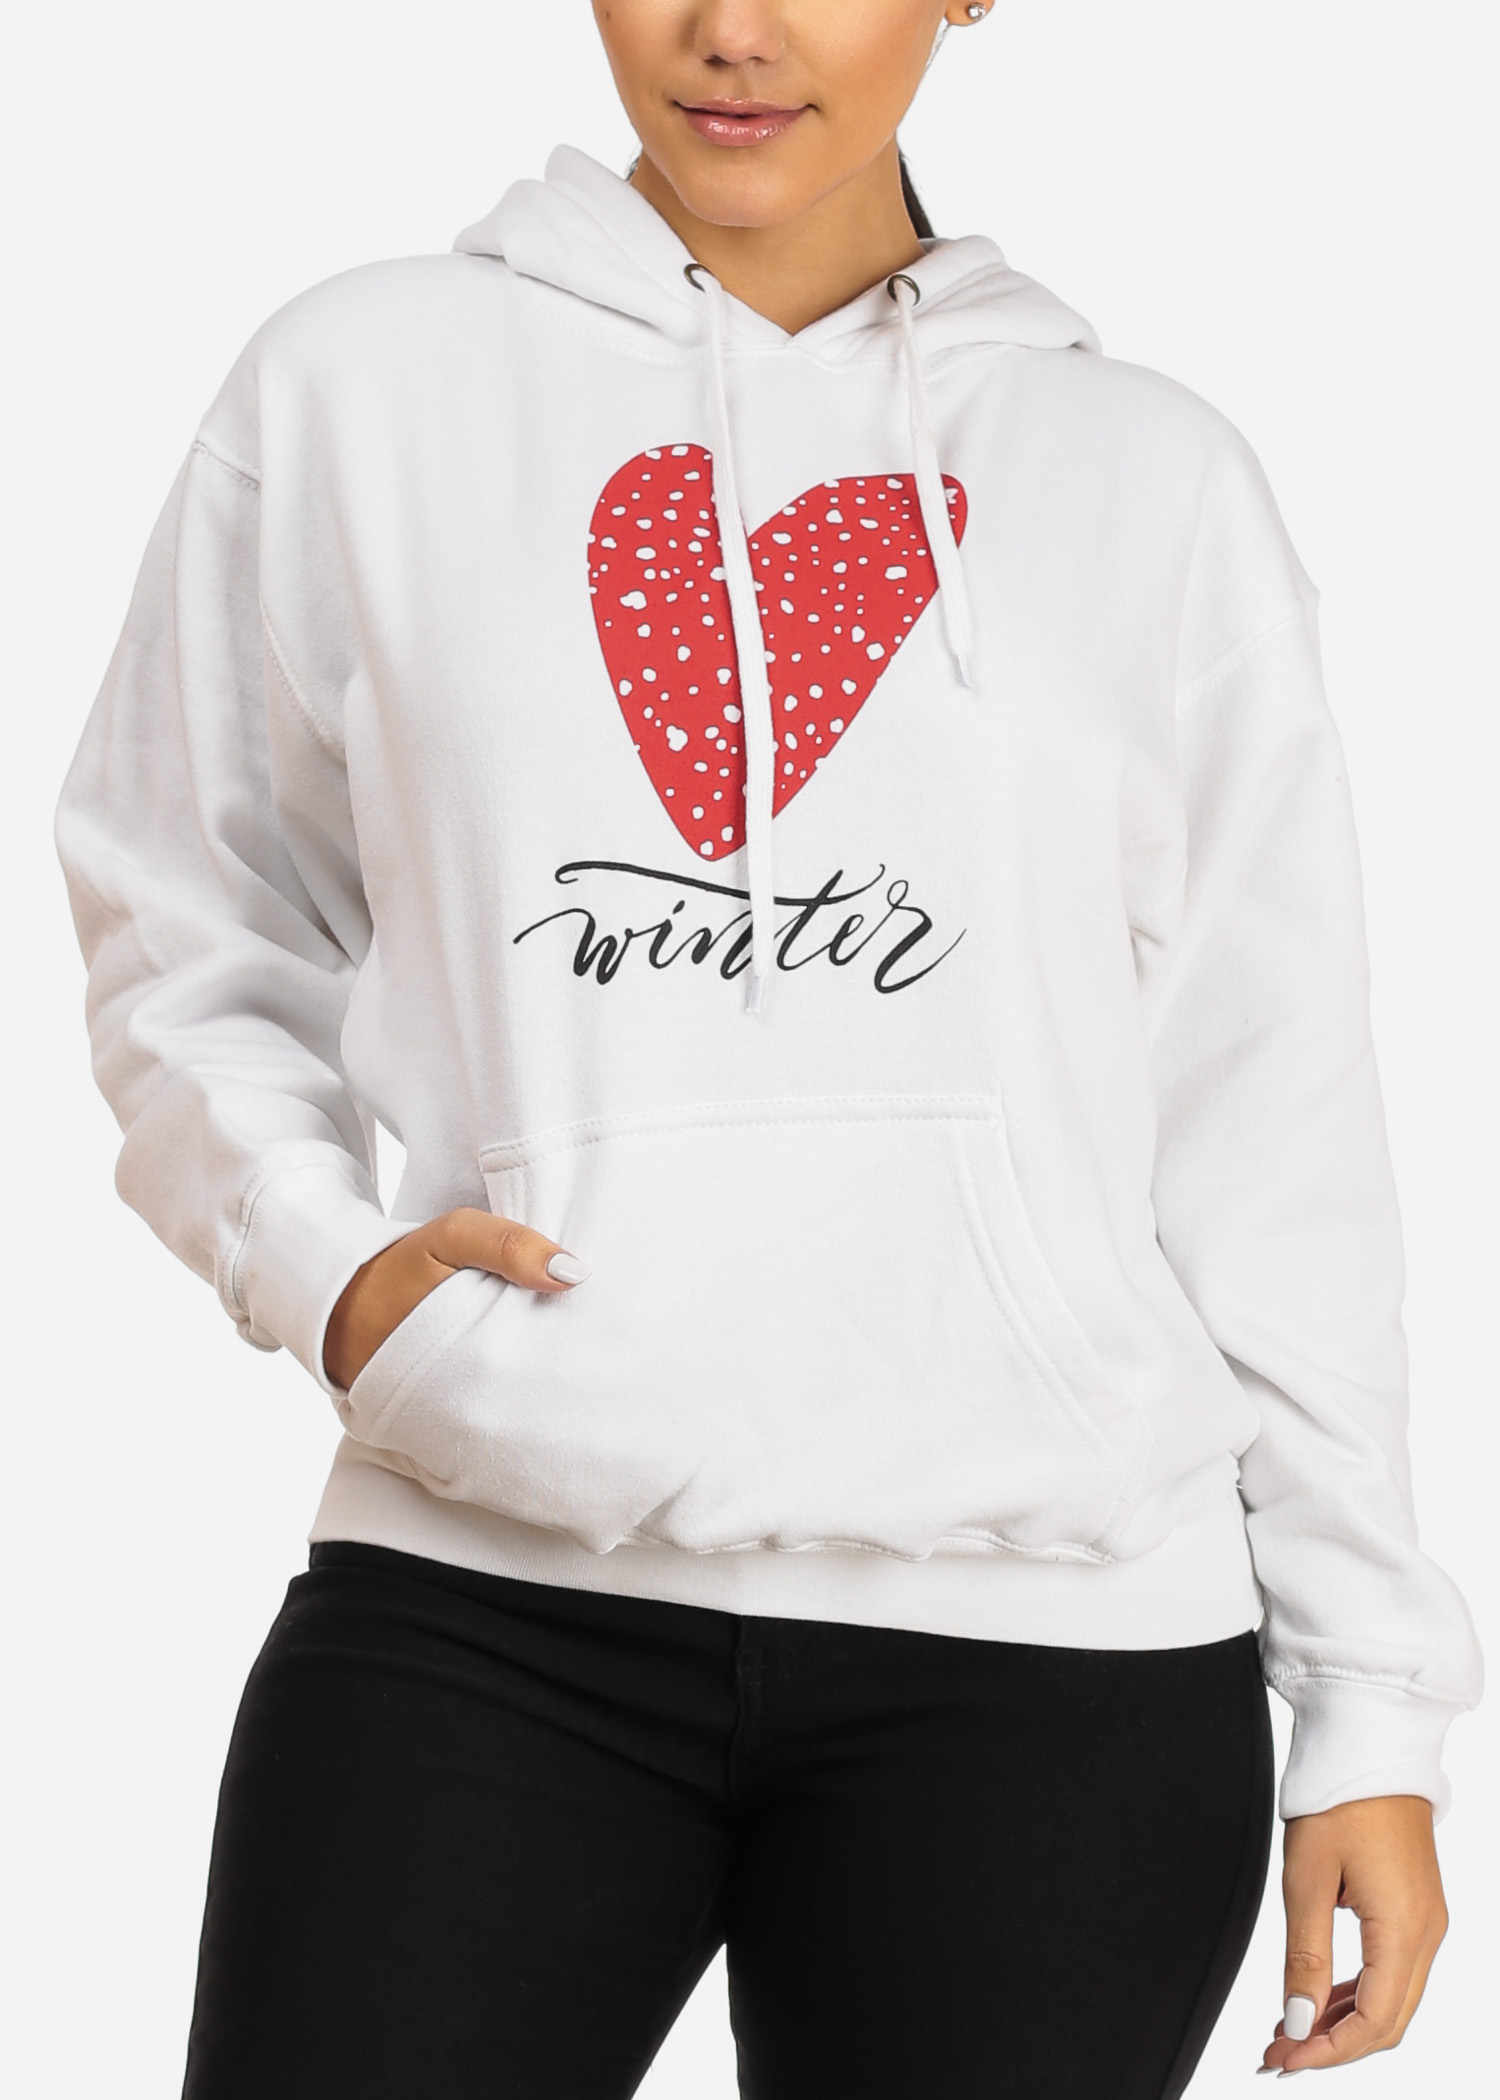 Womens Juniors Cozy Winter Love Graphic Print Long Sleeve White Sweater W Hood 30666S